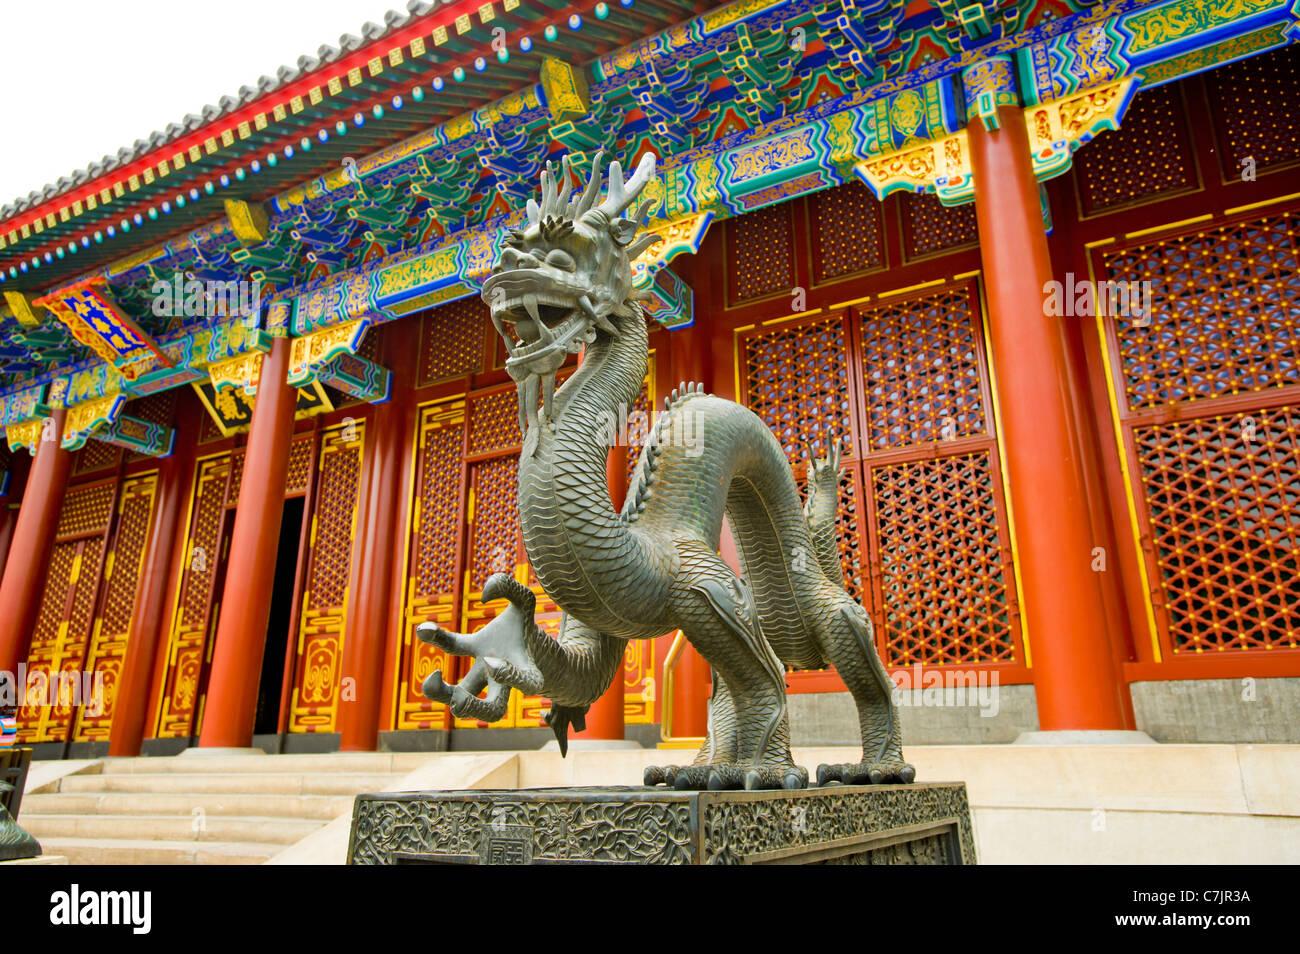 Hall of benevolence and longevity Peking beijing Summer Palace Gardens of Nurtured Harmony peaceful retreat largest - Stock Image